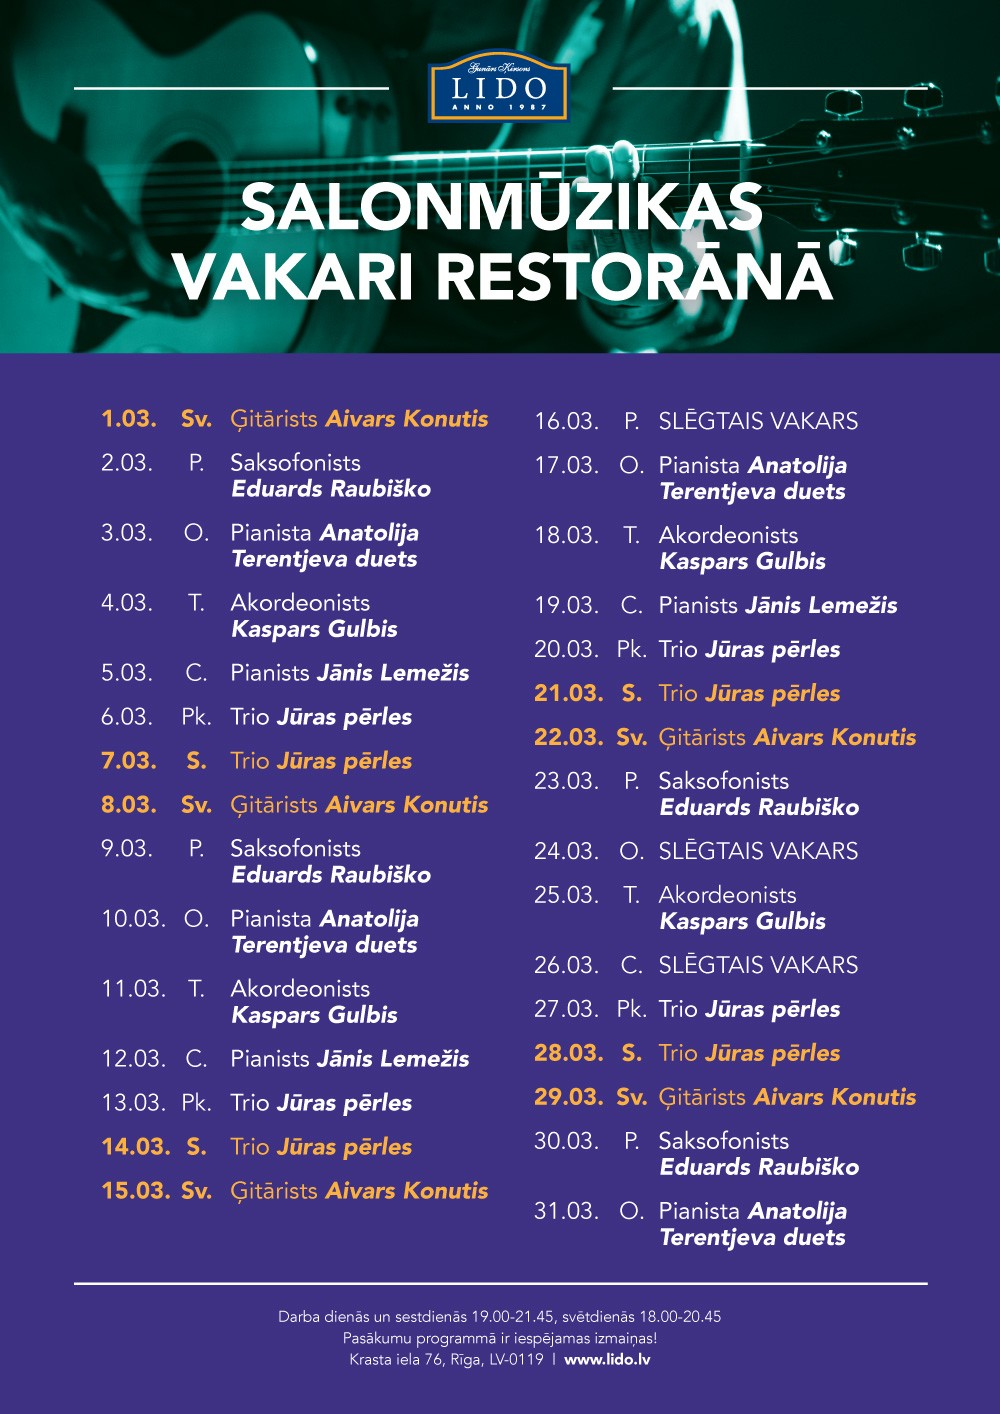 SalonmuzikaRestorans-Marts-A4-02.2020.jpg